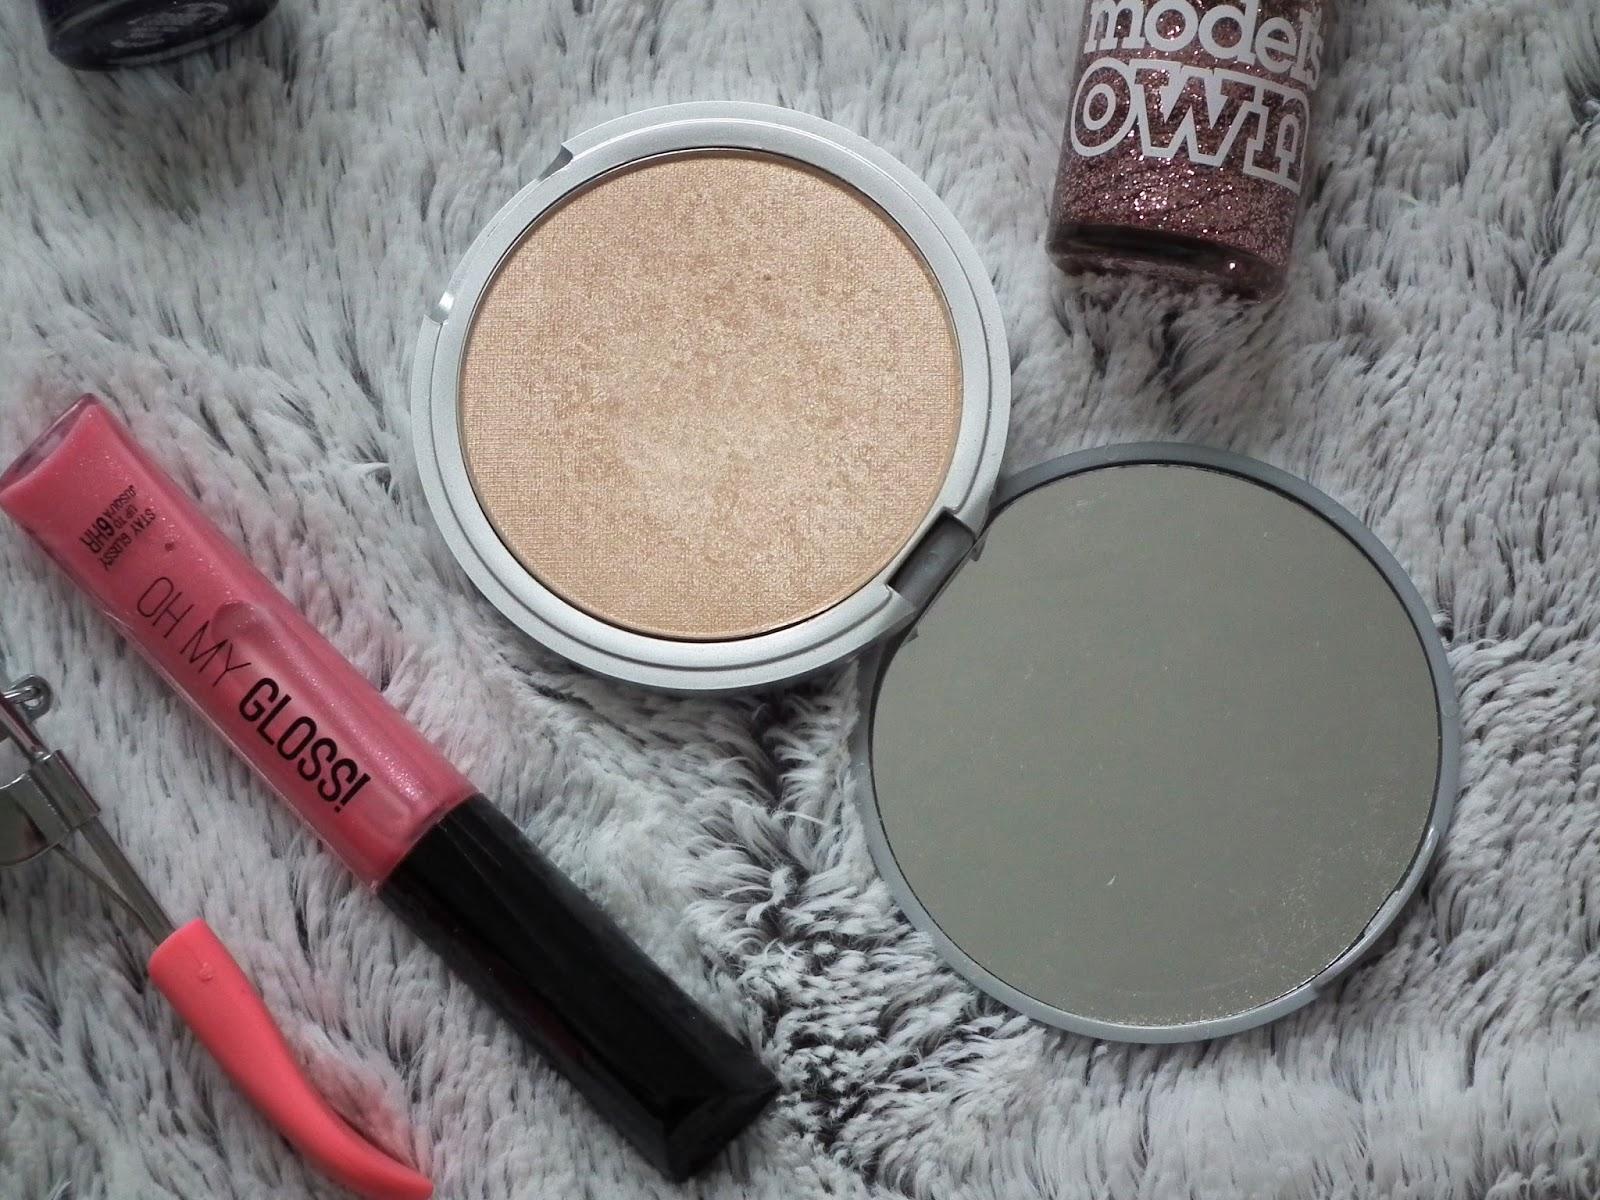 Eyelash curles, lip gloss & highlighter